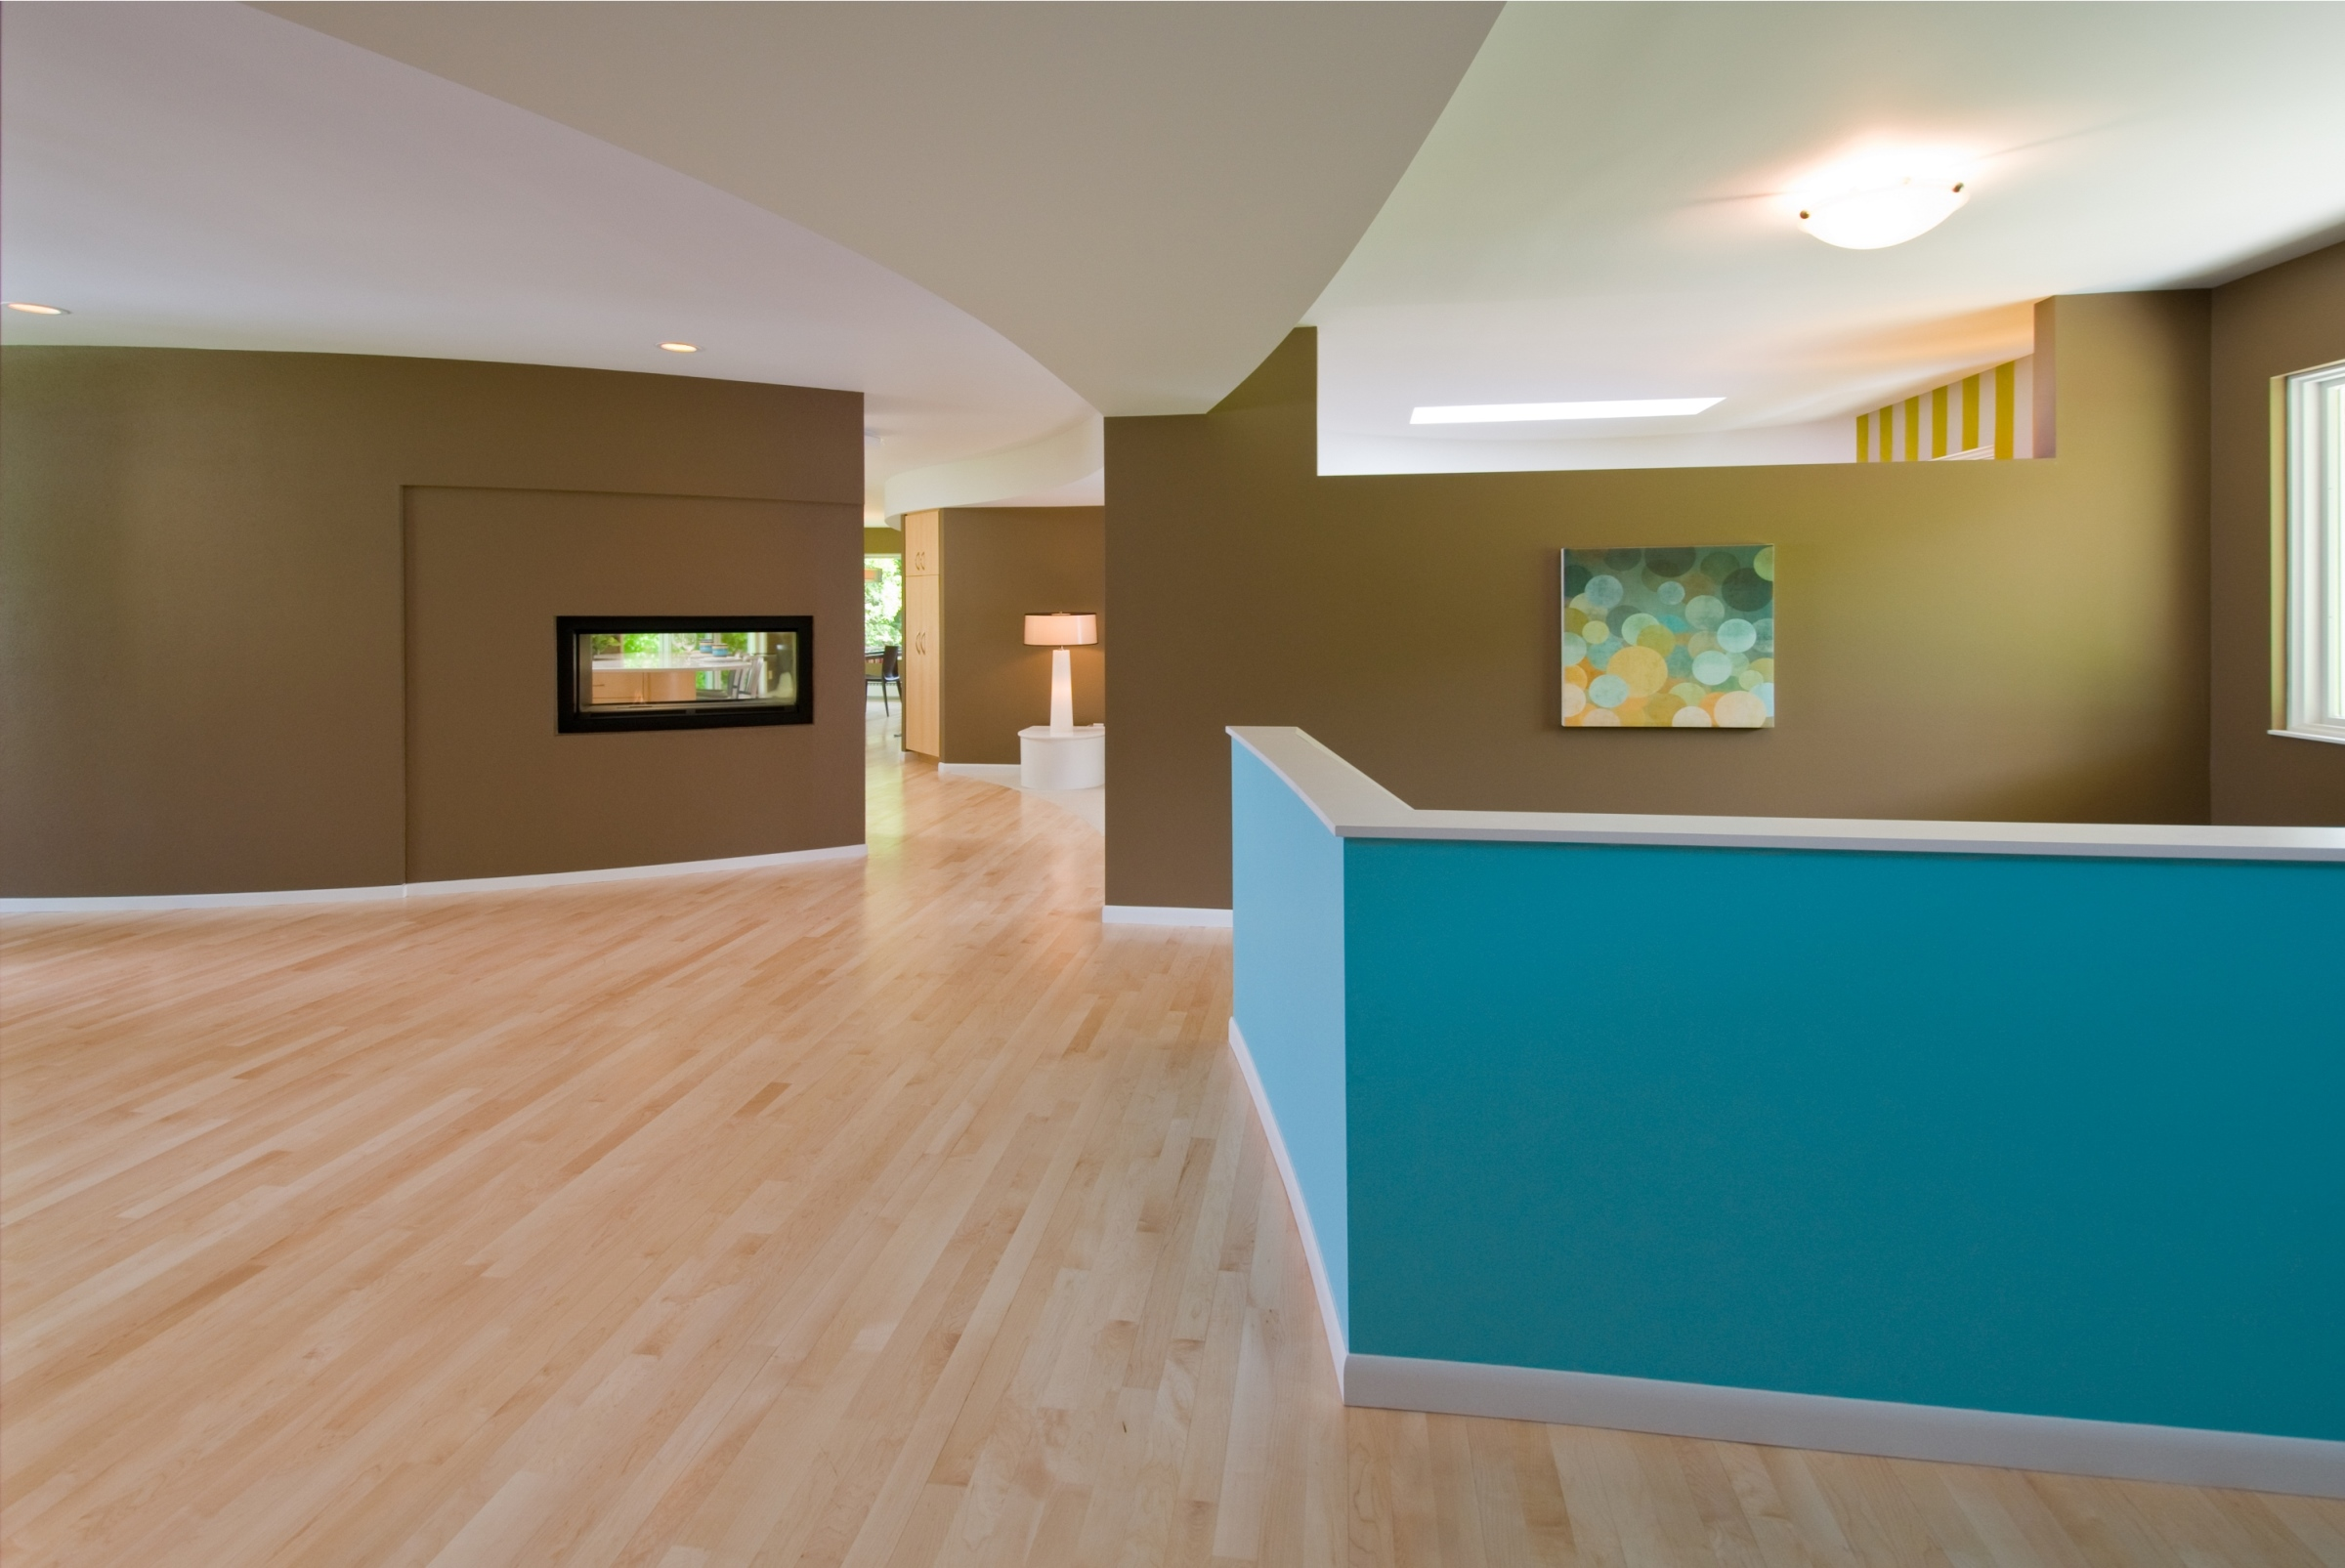 Interiors_10.jpg